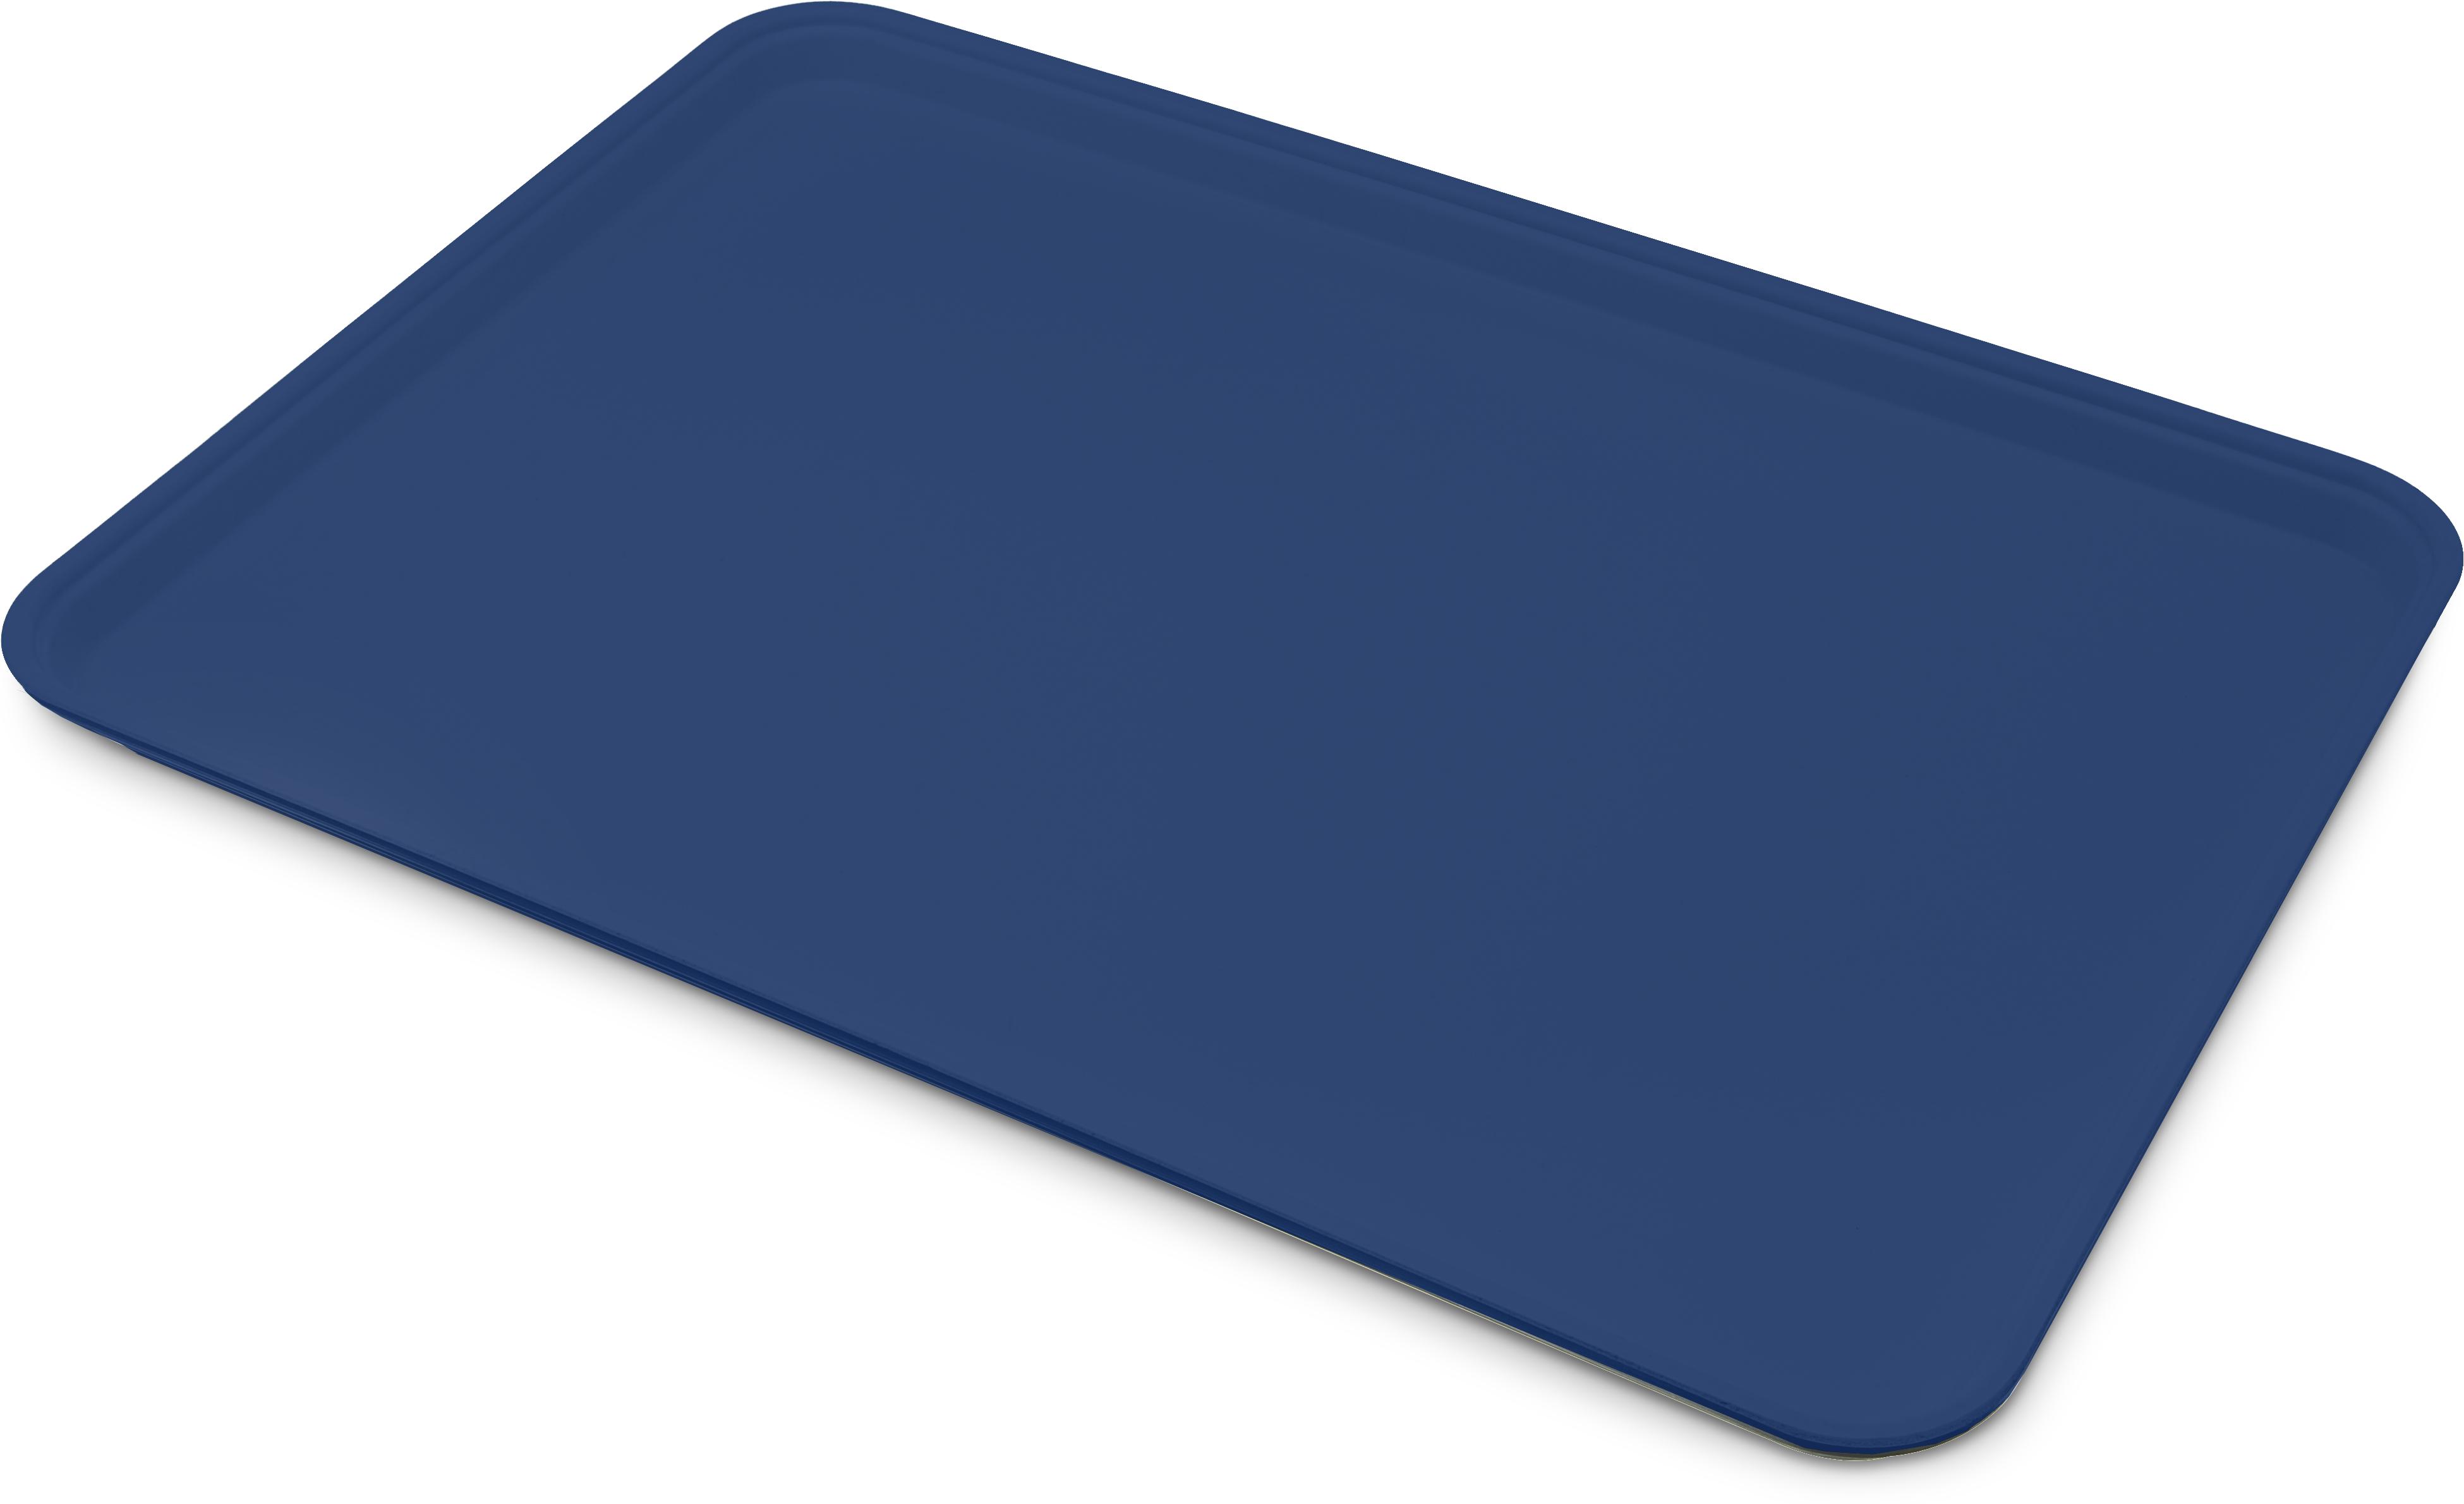 Glasteel Tray Display/Bakery 17.9 x 25.6 - Sapphire Blue